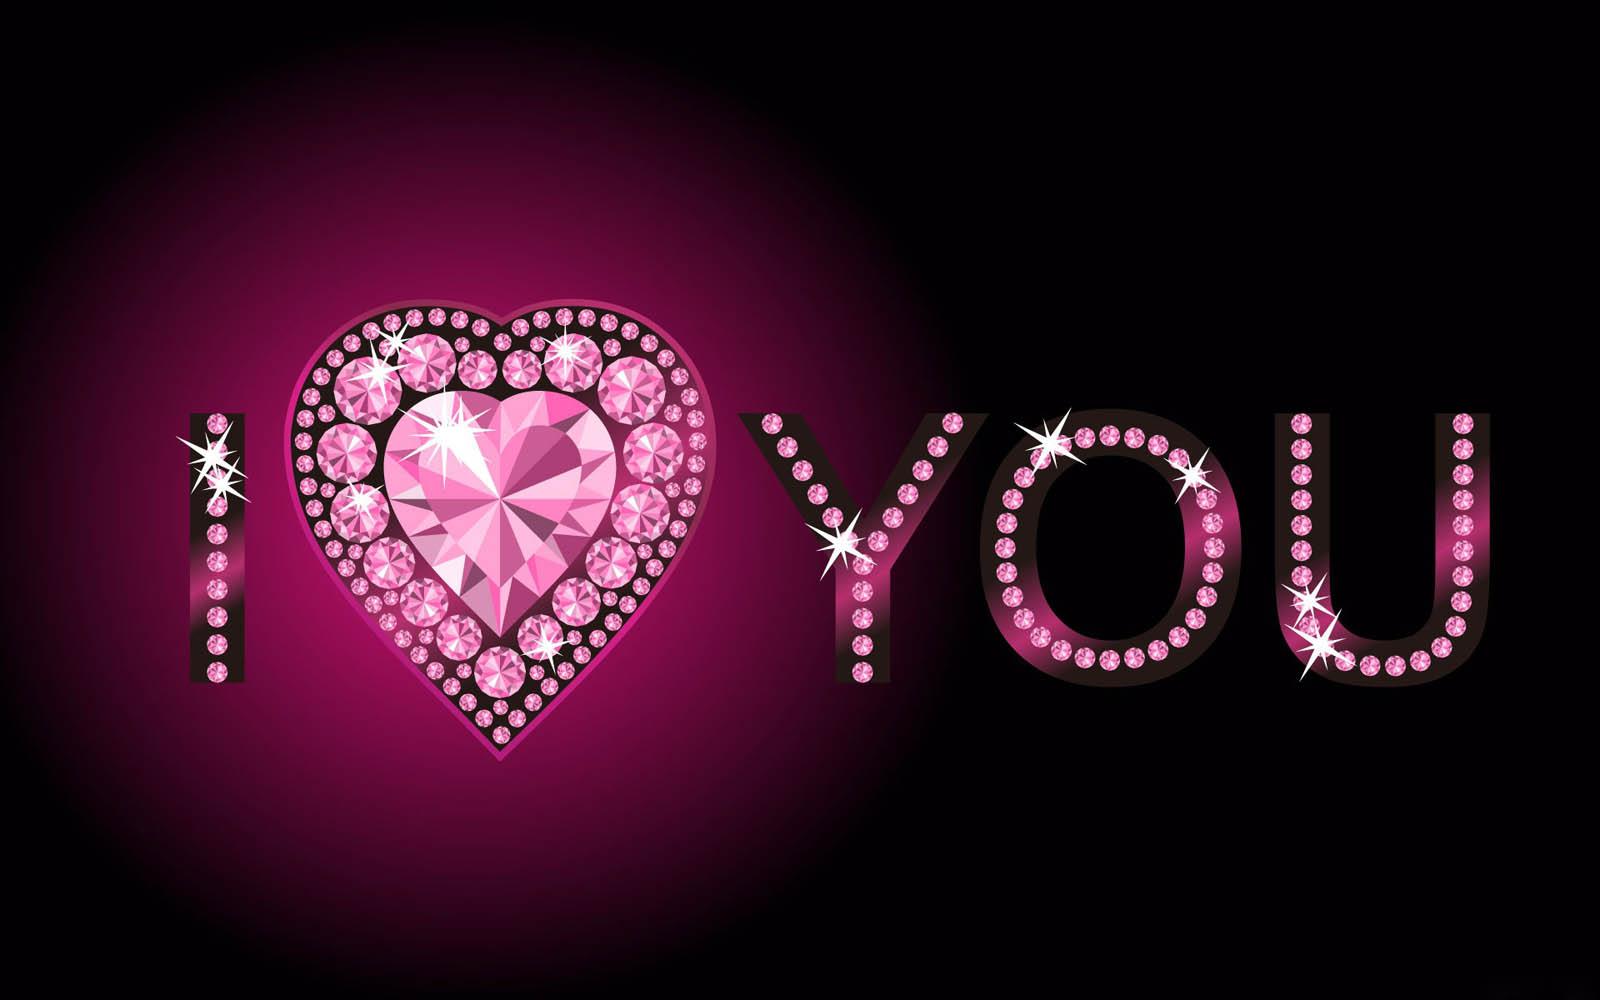 http://3.bp.blogspot.com/-YYeRi6BVeVQ/T8sQMmXnS8I/AAAAAAAADhg/1yf4-7cJ3Ds/s1600/I+Love+You+Wallpapers+3.jpg